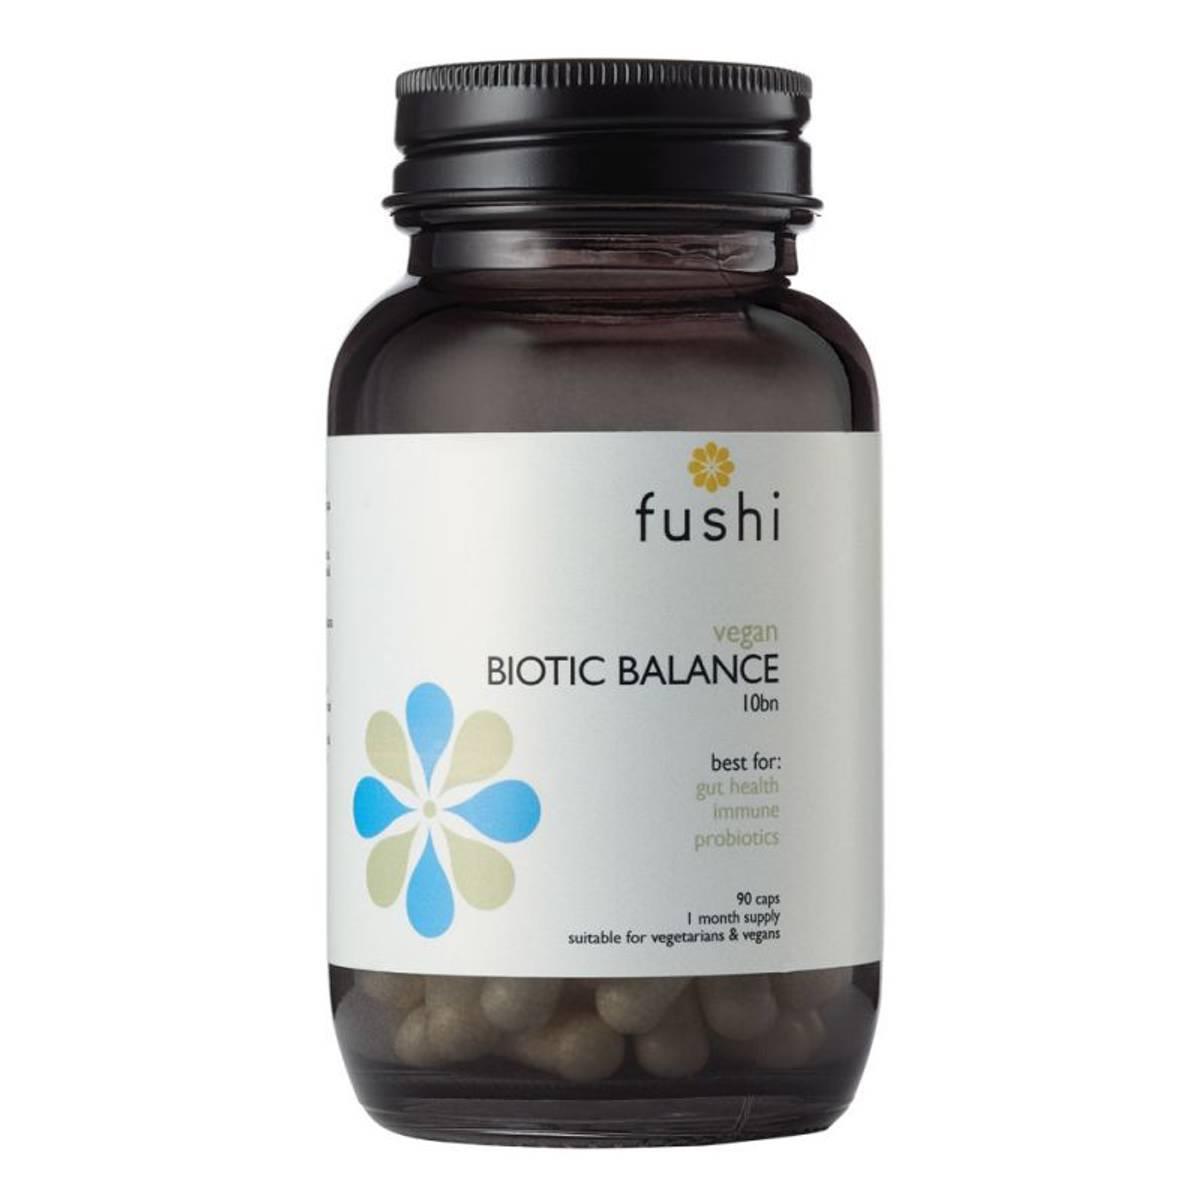 Biotic Balance - vegansk probiotika 10bn / Fushi Wellbeing